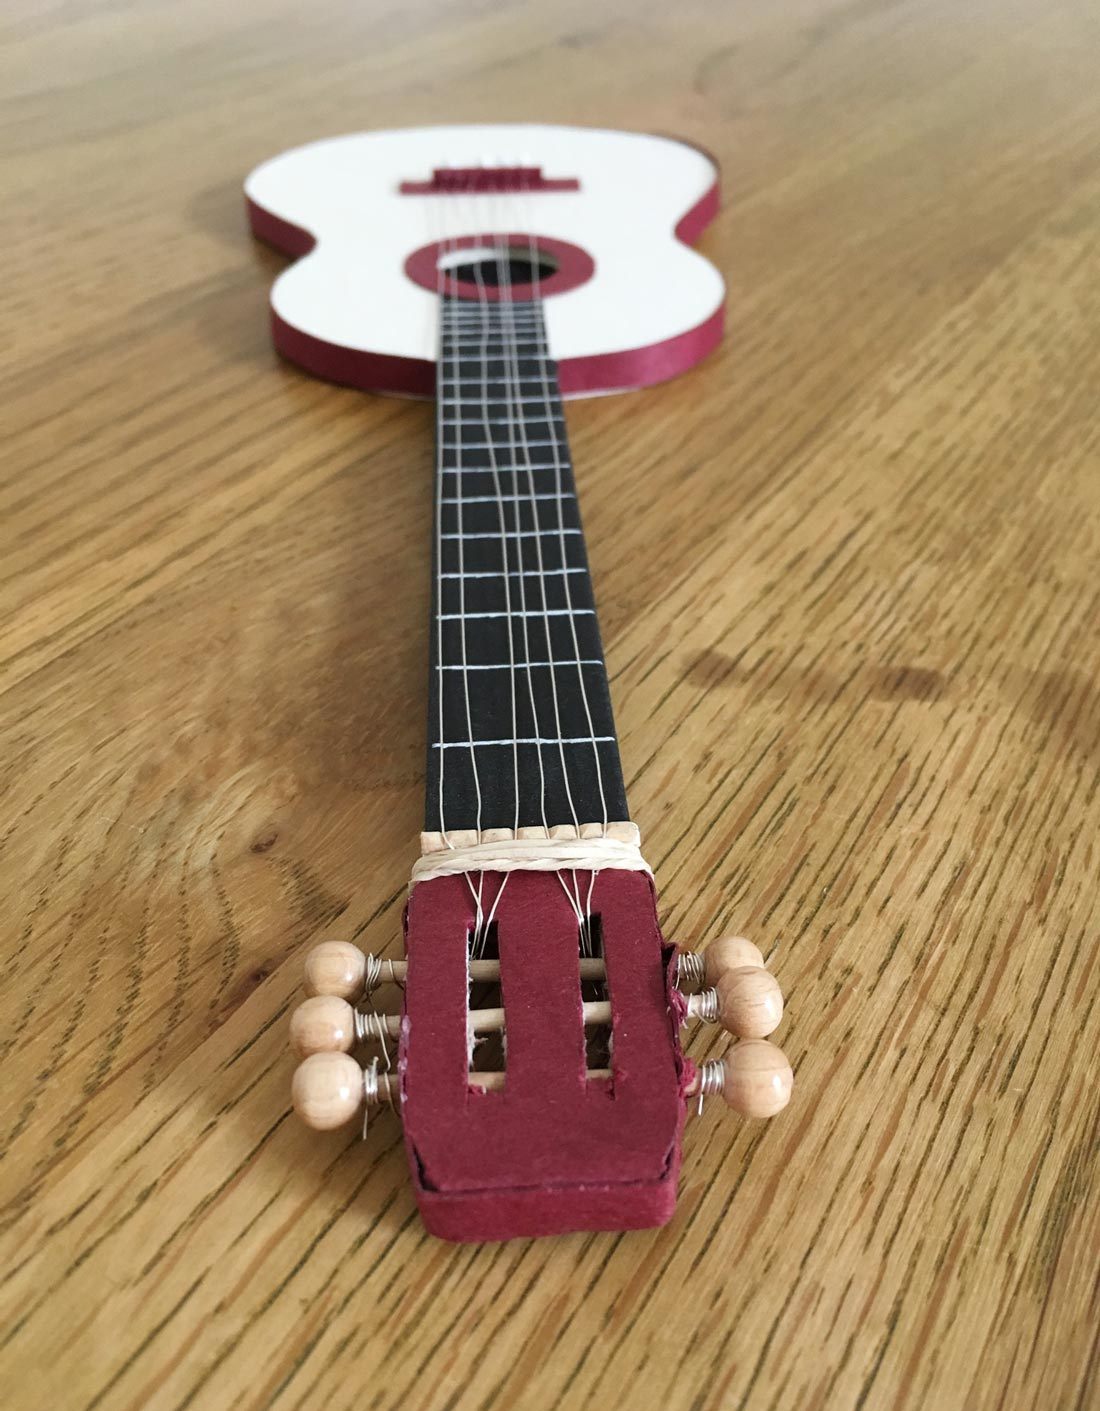 Fertige Gitarre von Kopf aus fotografiert